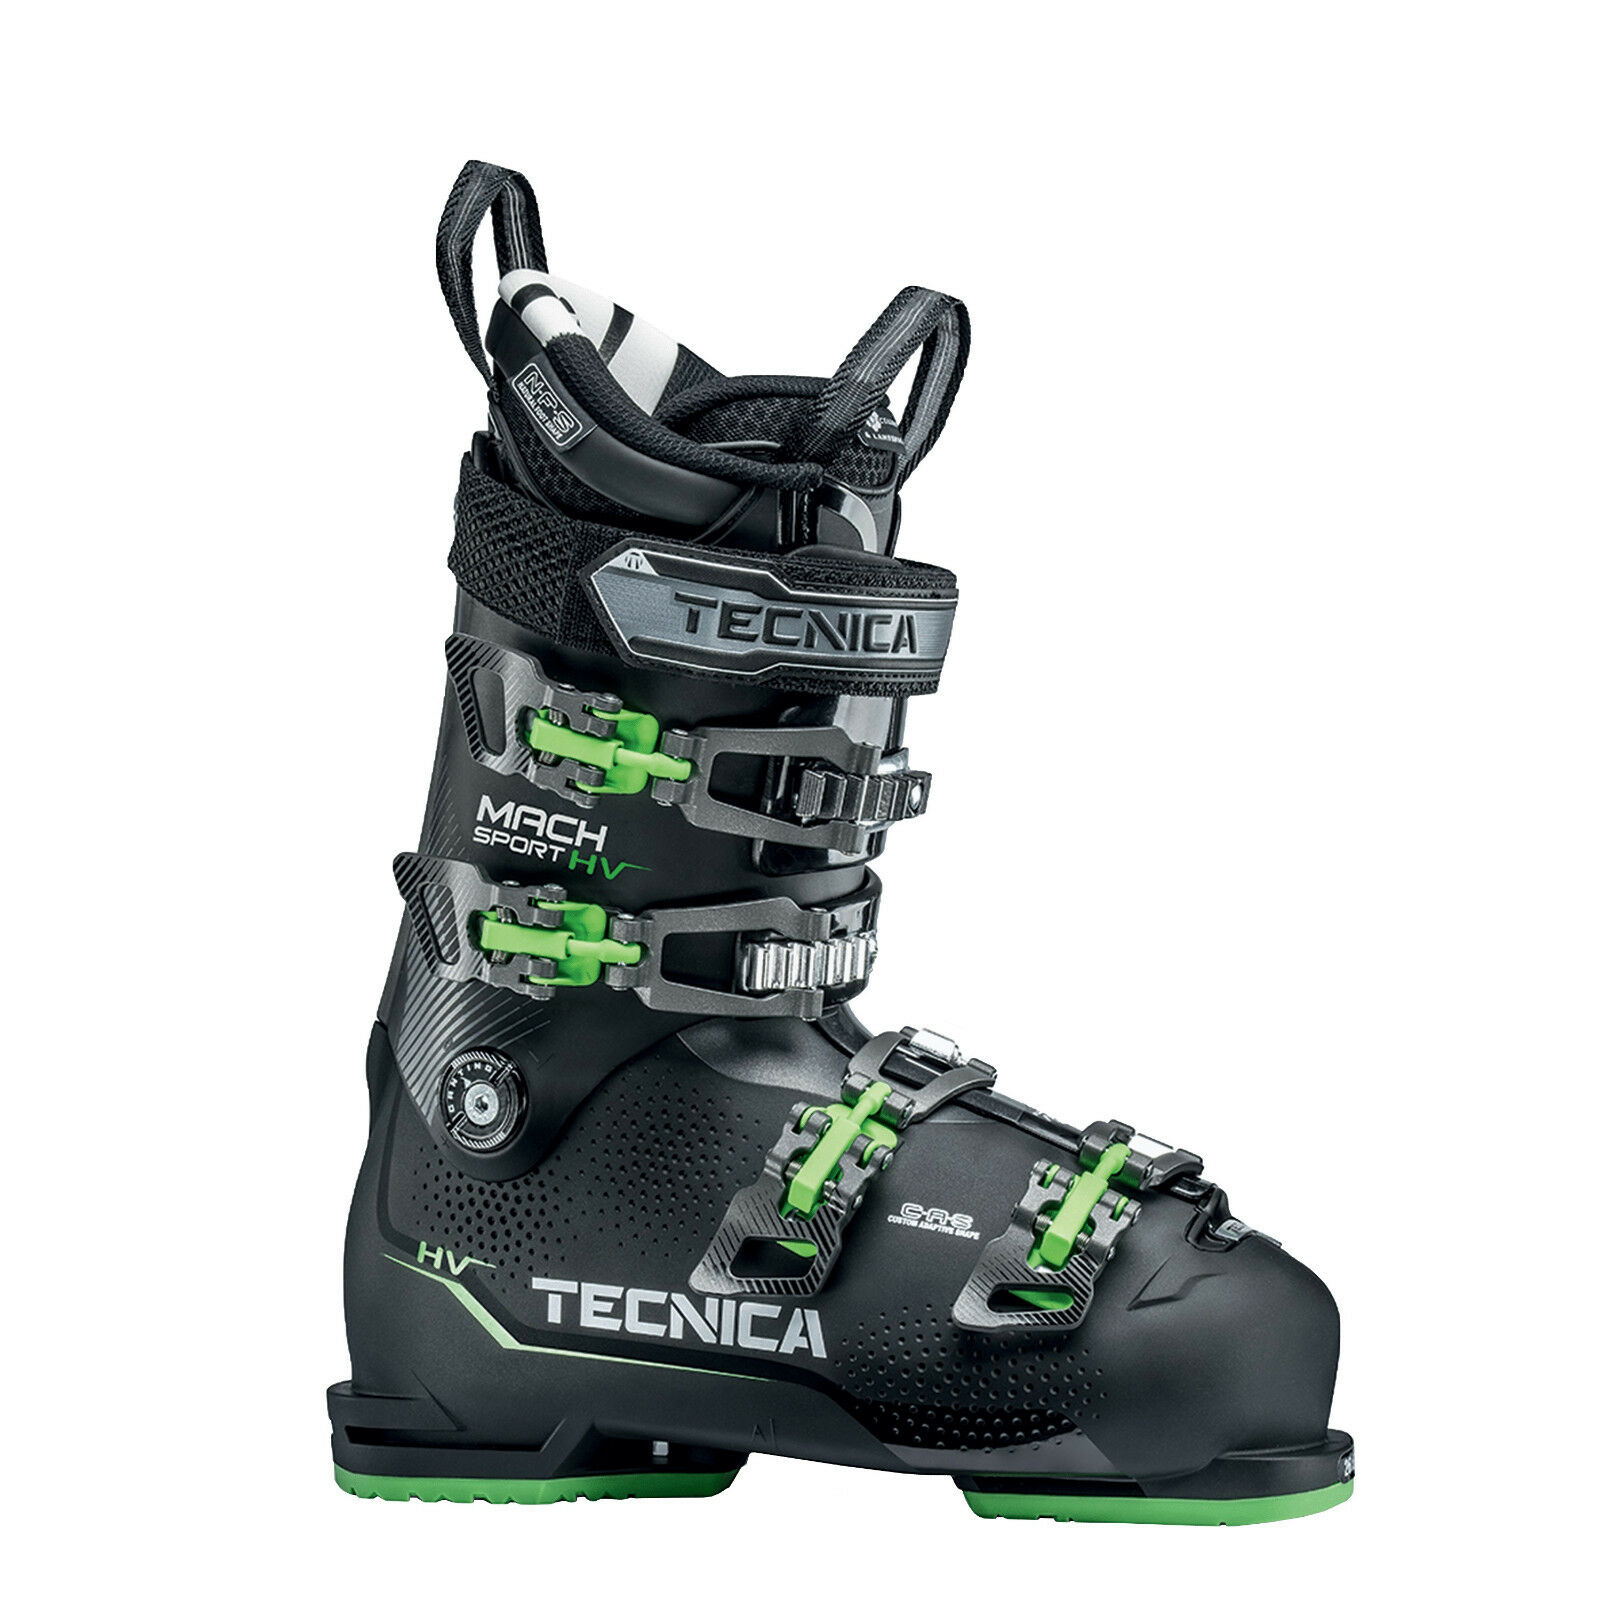 Tecnica Mach Sport 120 HVL Ski Stiefel - Sie's - 2019 - 28.5 MP   US 10.5 US